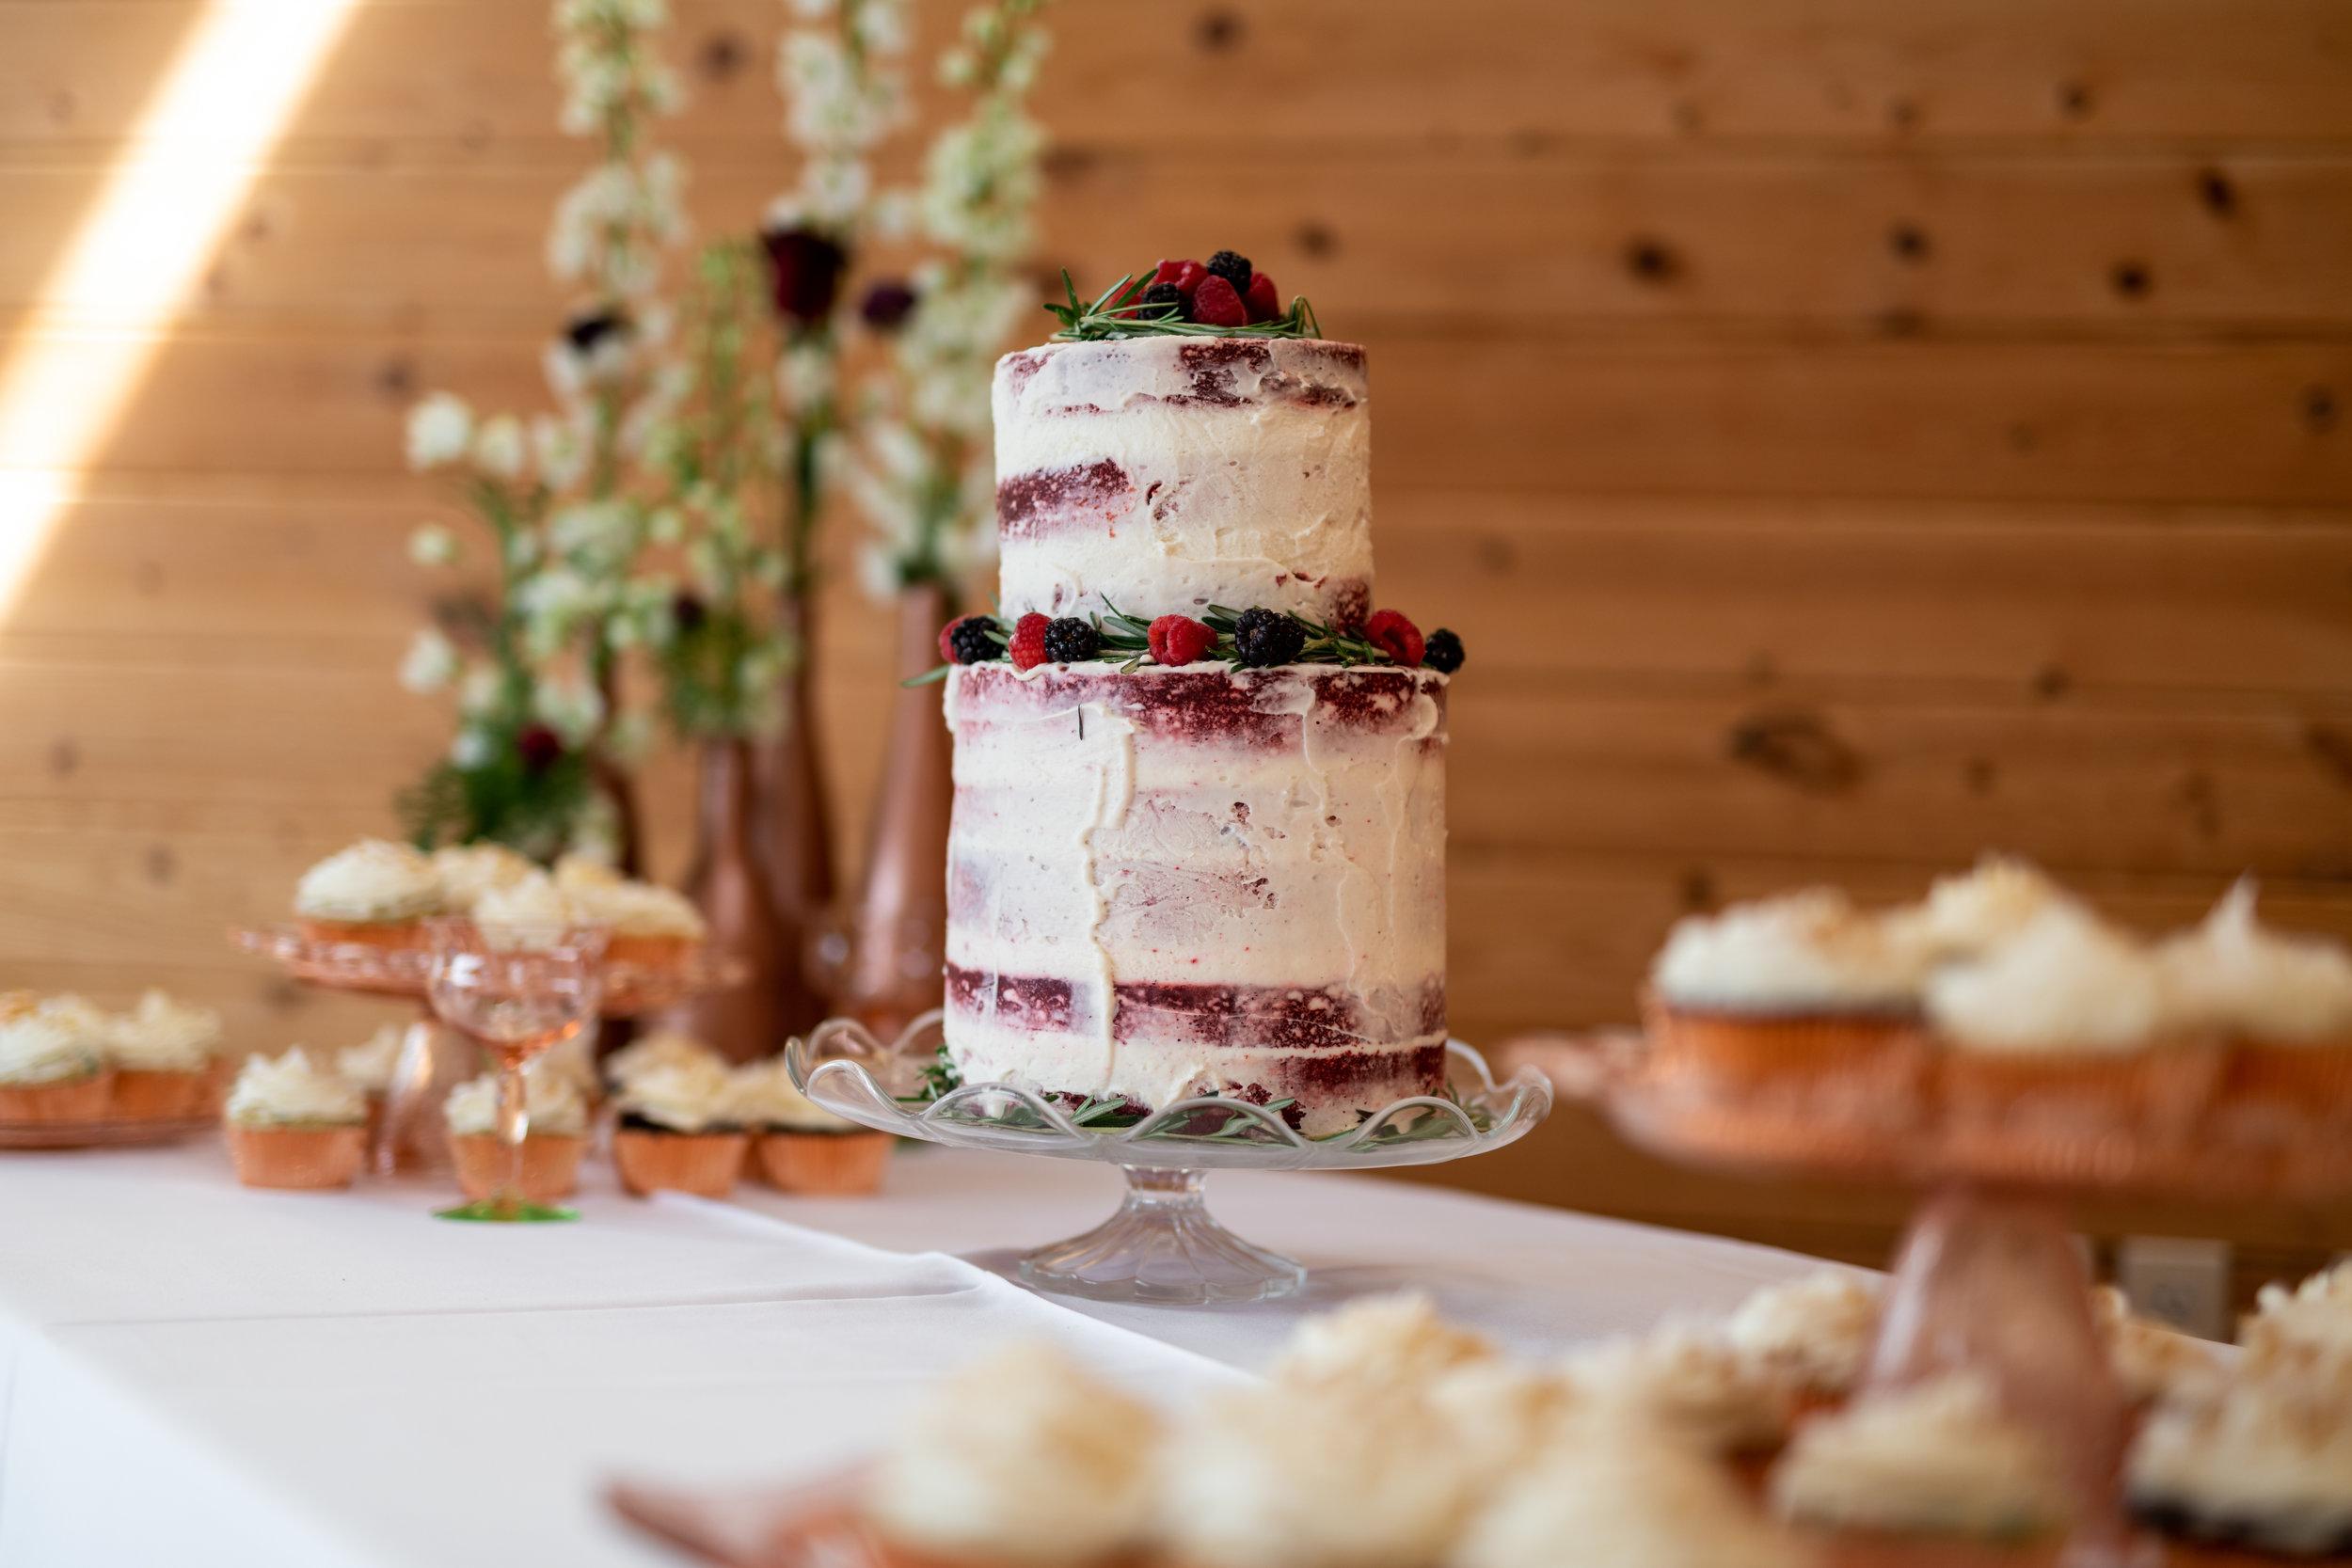 Spokane green bluff wedding dress bride cake